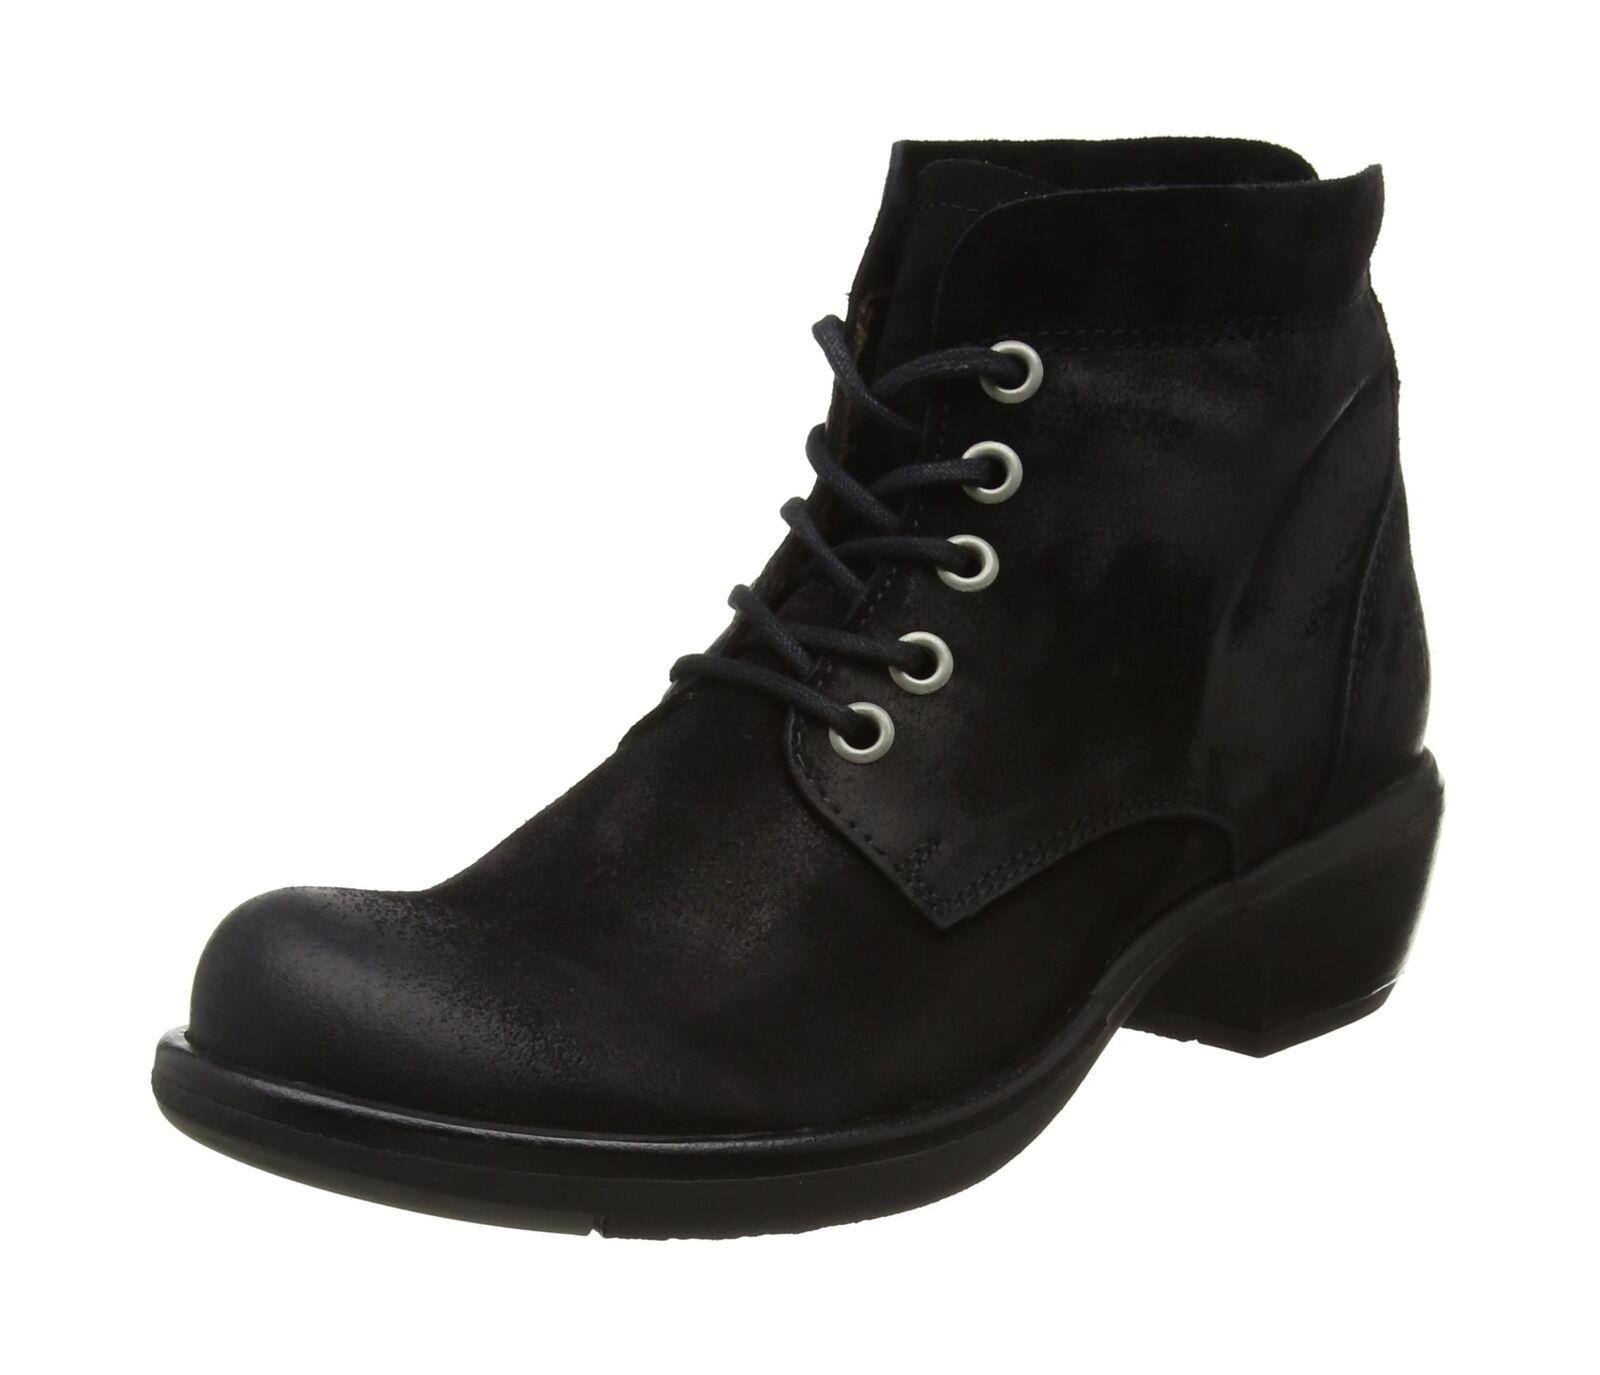 Fly London Women's Mesu780fly Boots Black (Black) 4 UK